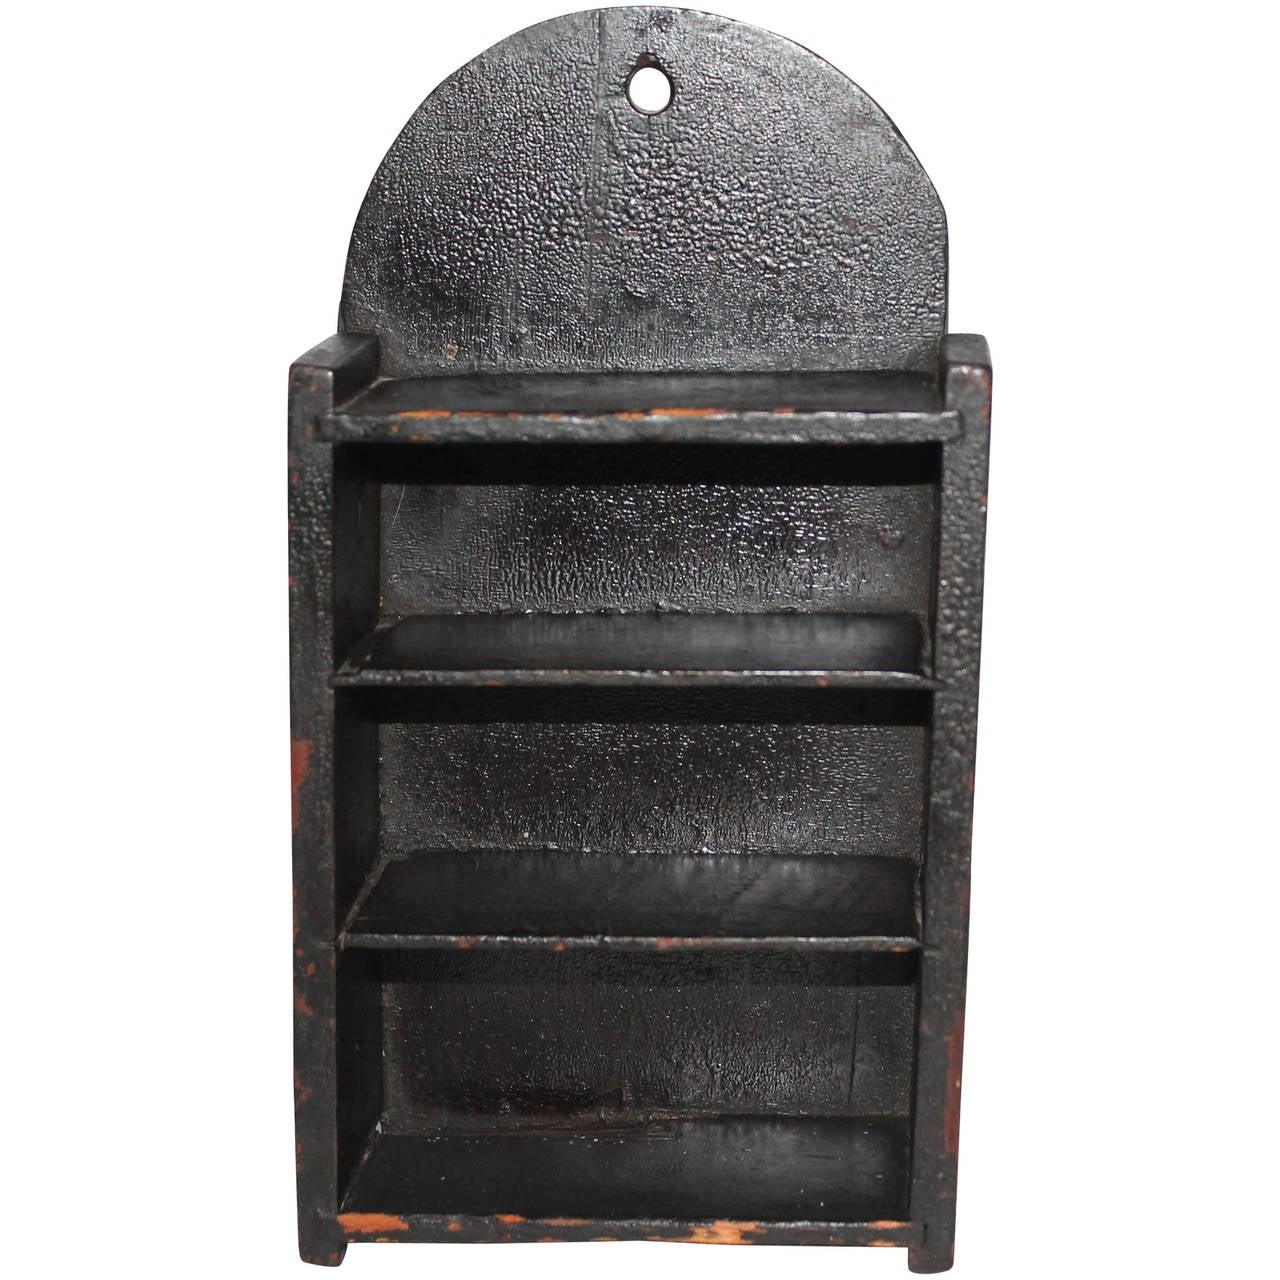 19th Century Original Black Painted Wall Box or Shelf